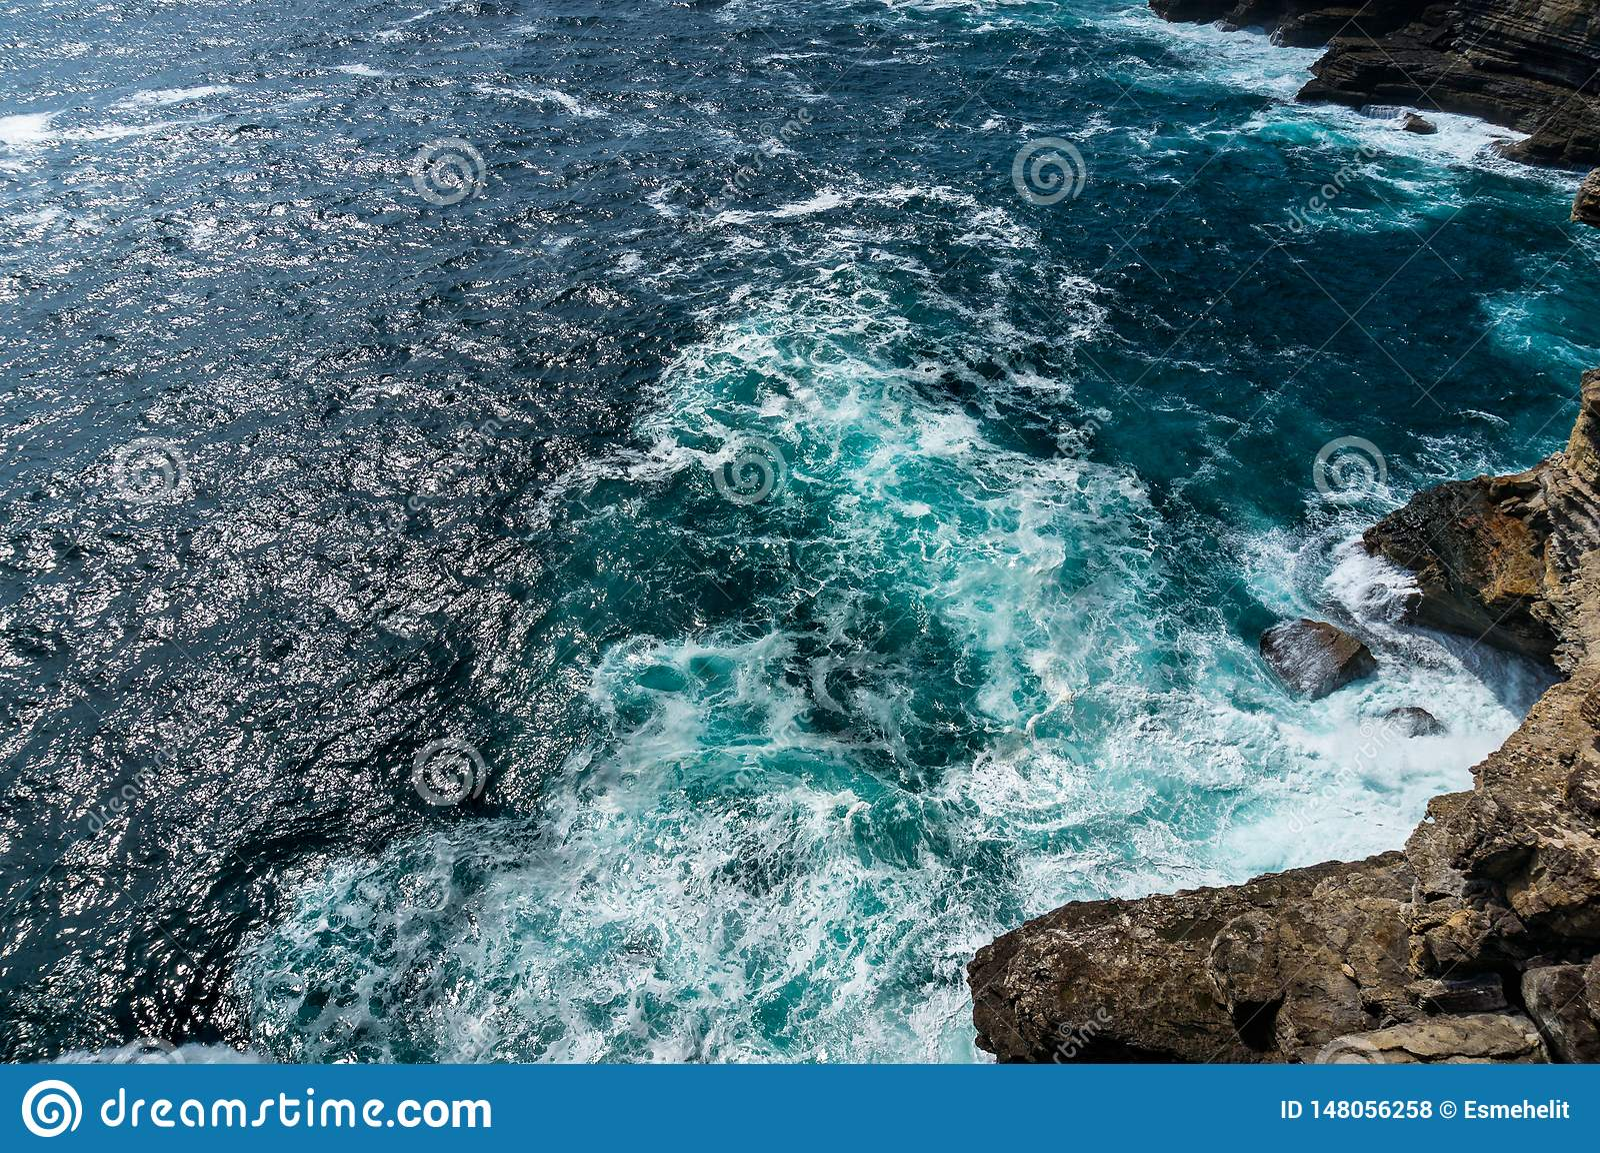 Hd Wallpaper Seagulls Flying Over Beach Action Animals Blue Sky Daylight Wallpaper Flare